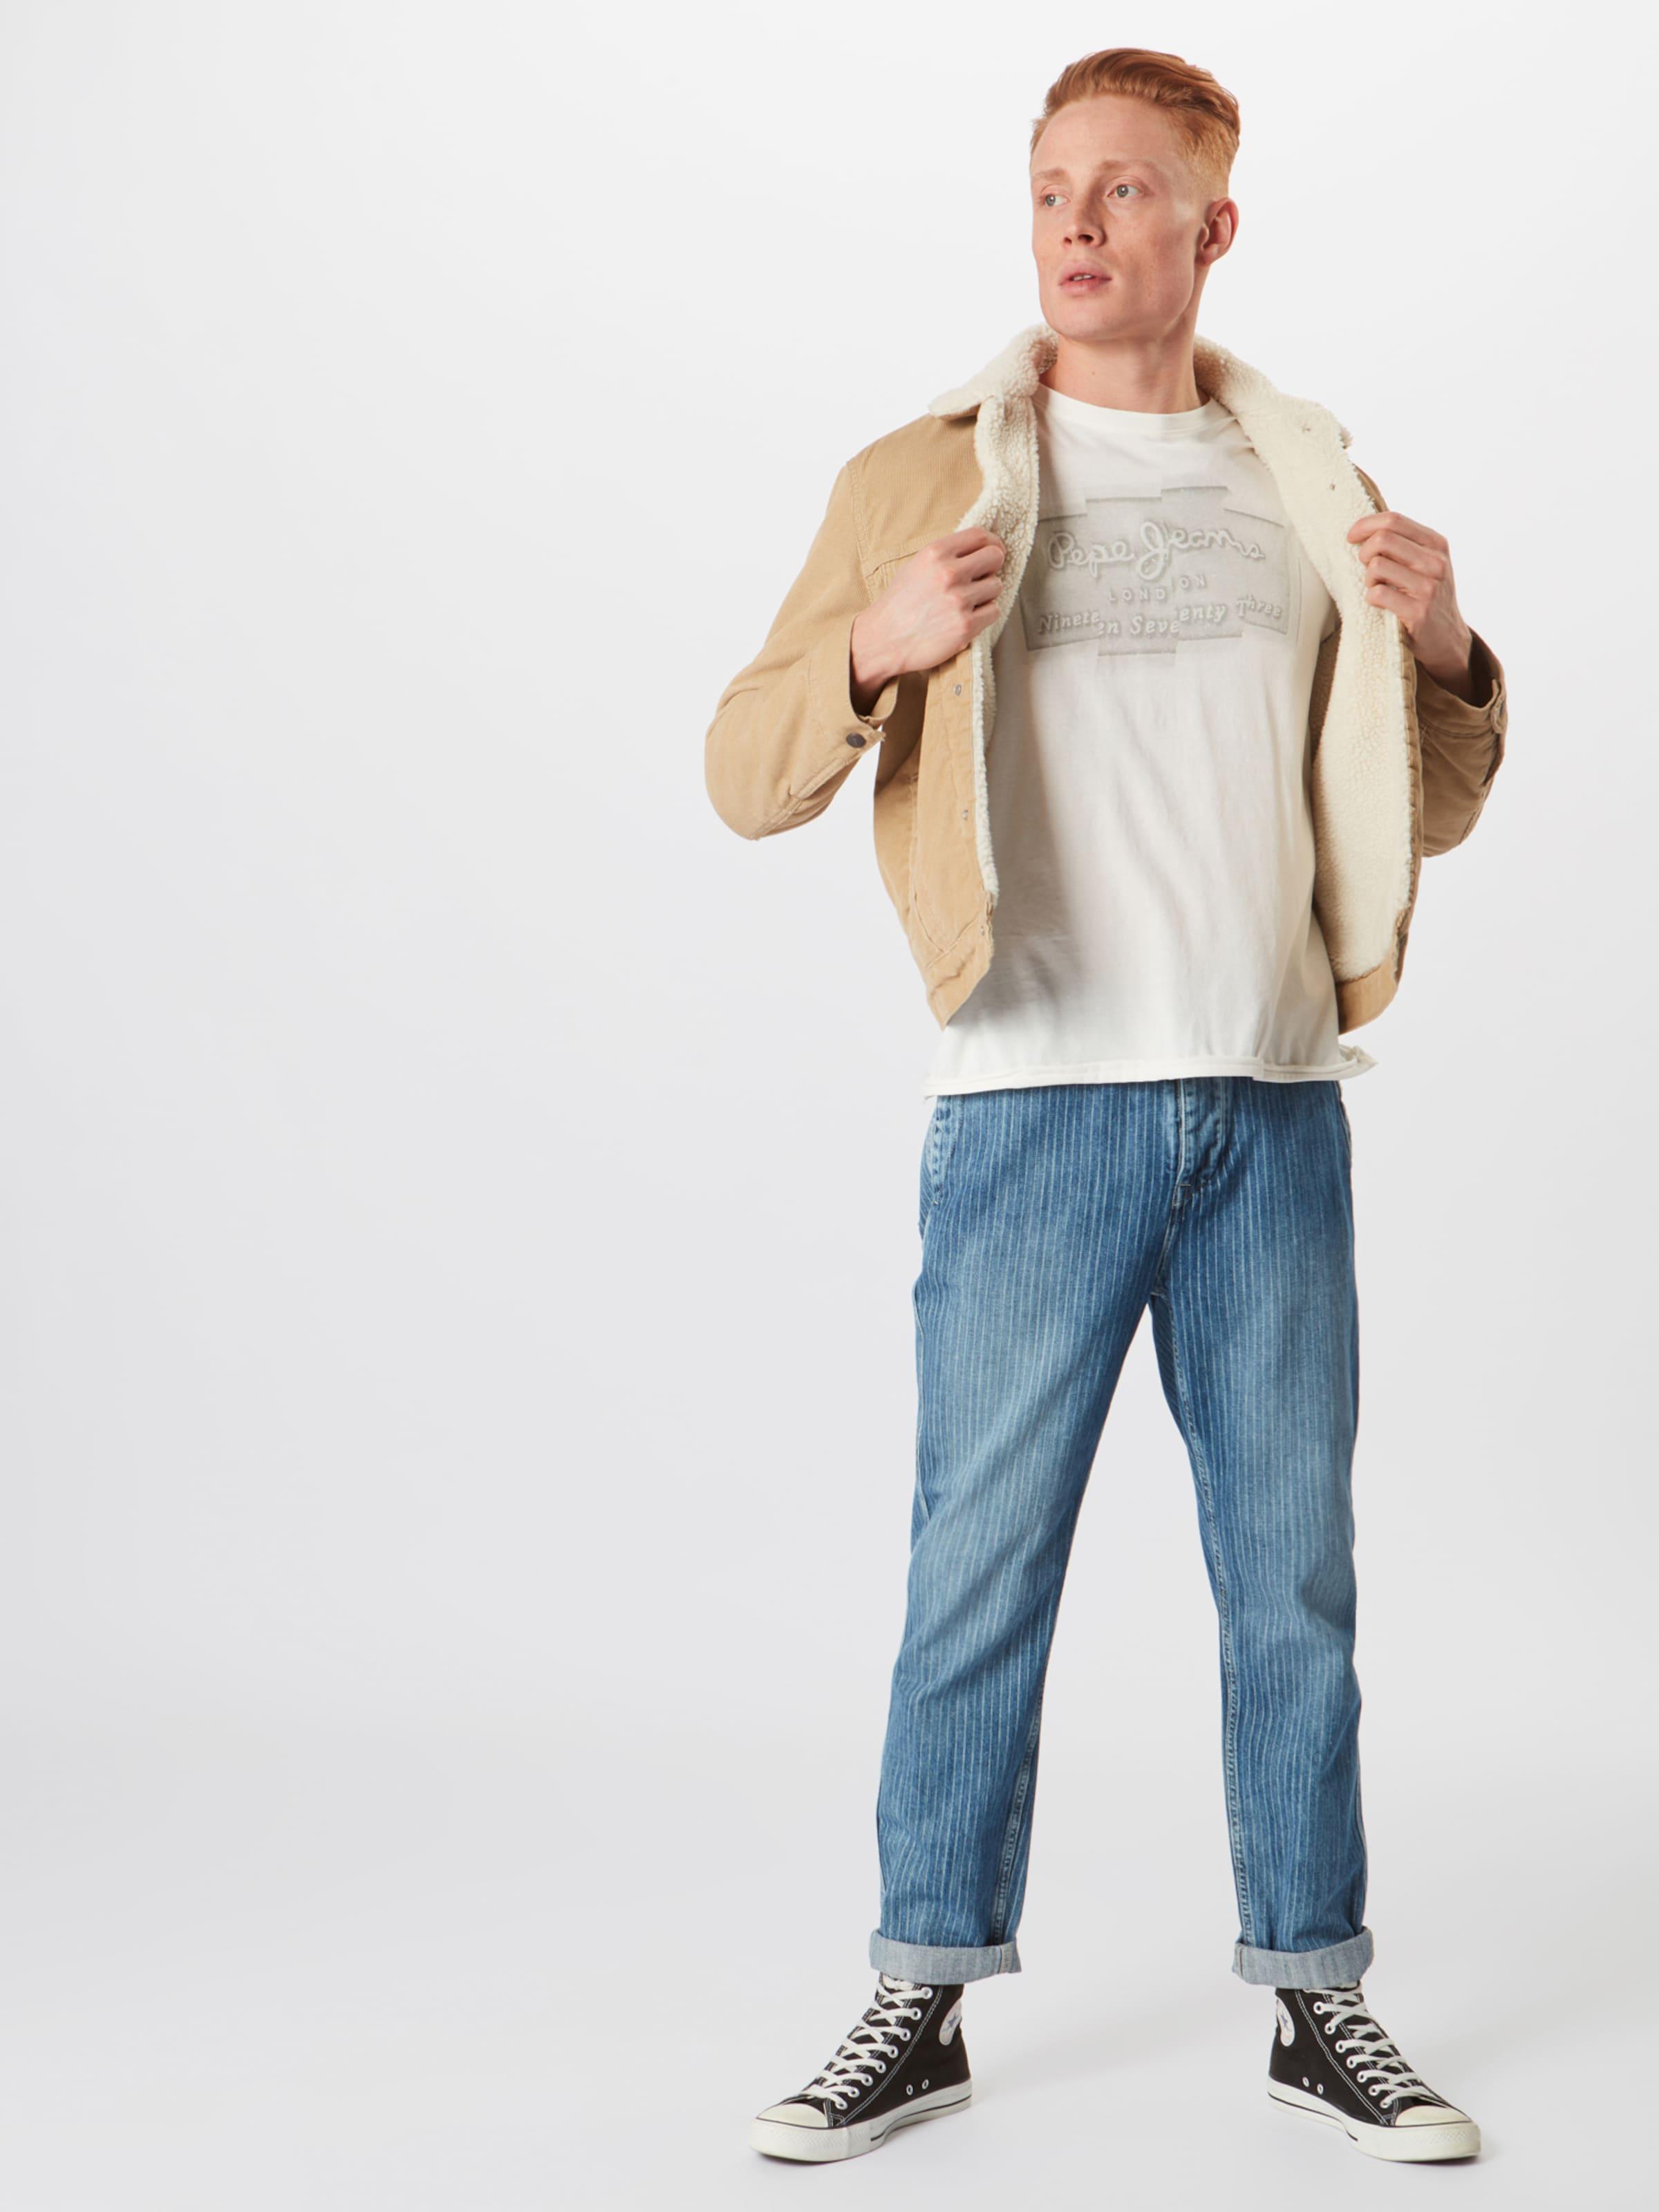 Pinstripe' Jeans Pepe In 'trade Blue Denim Qrdtsh